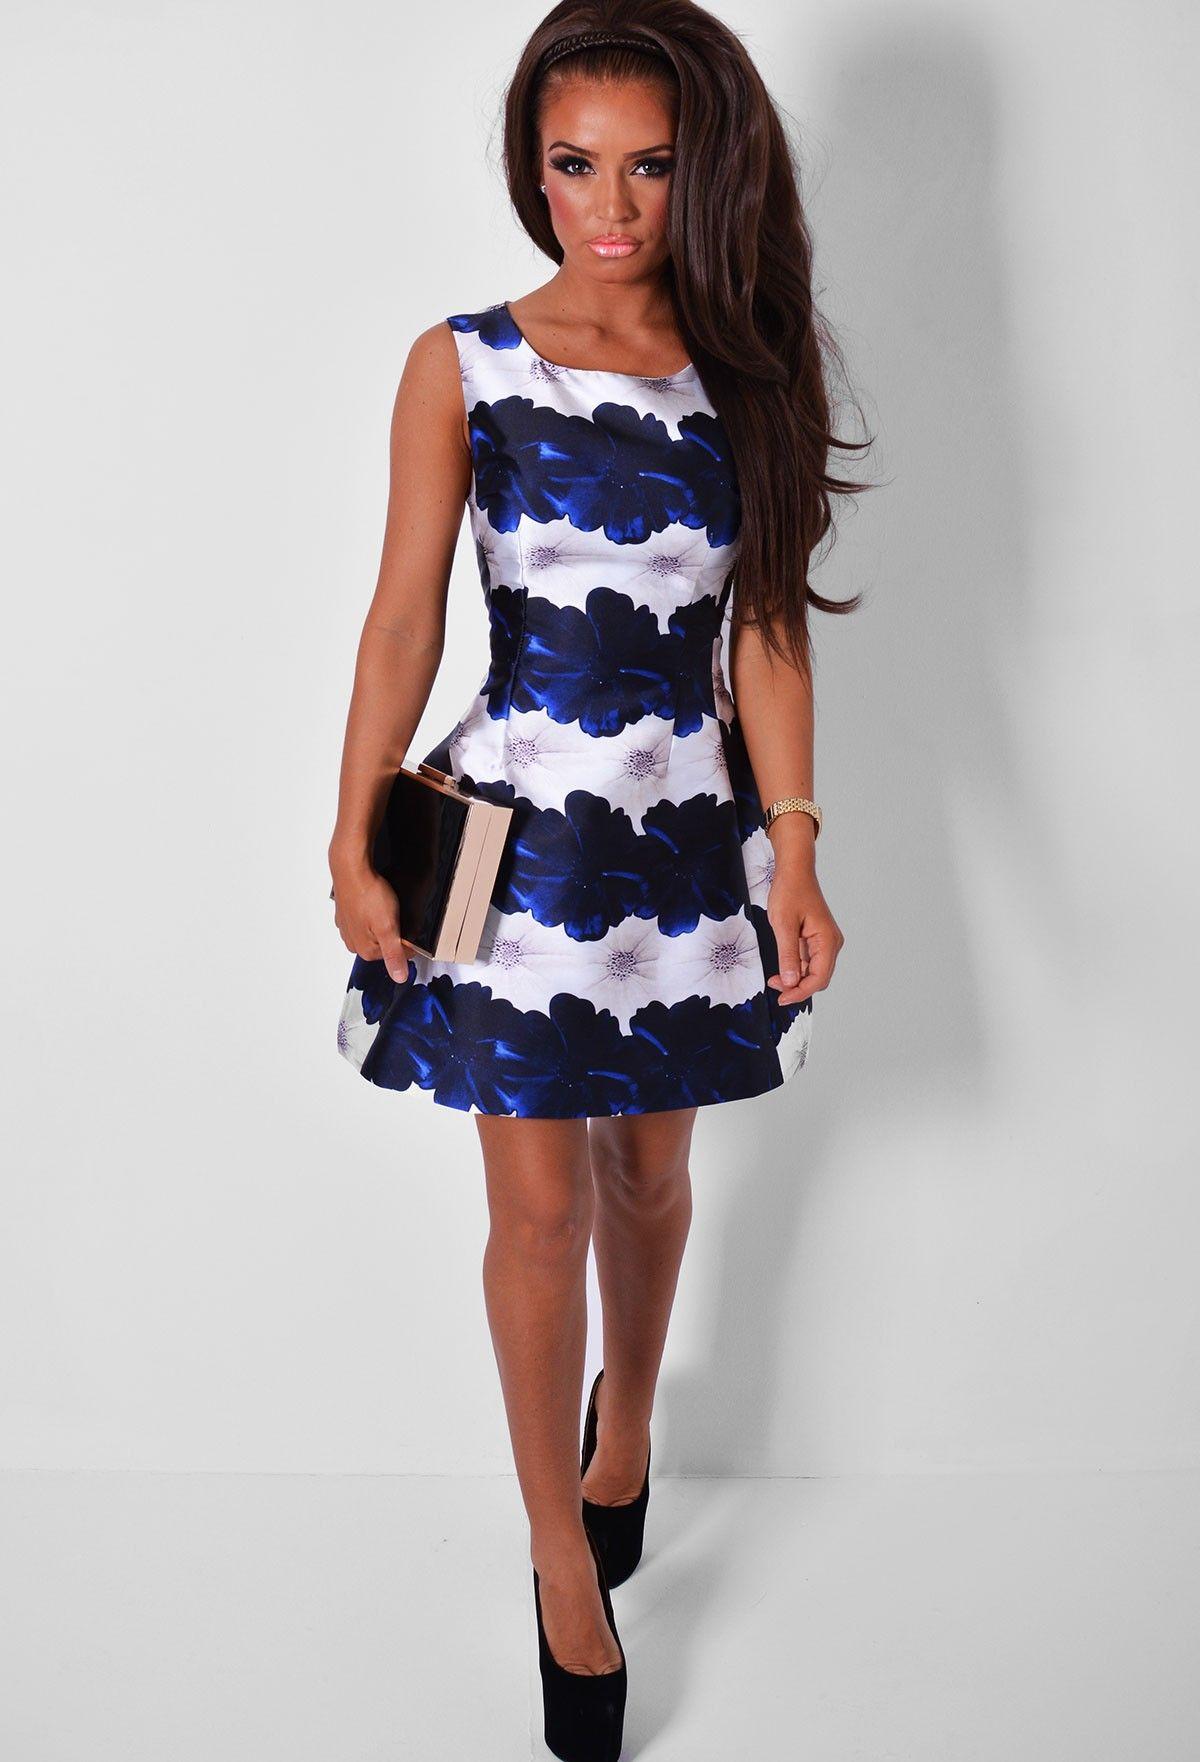 Orleans Navy & White Floral Print Skater Dress | Pink Boutique ...